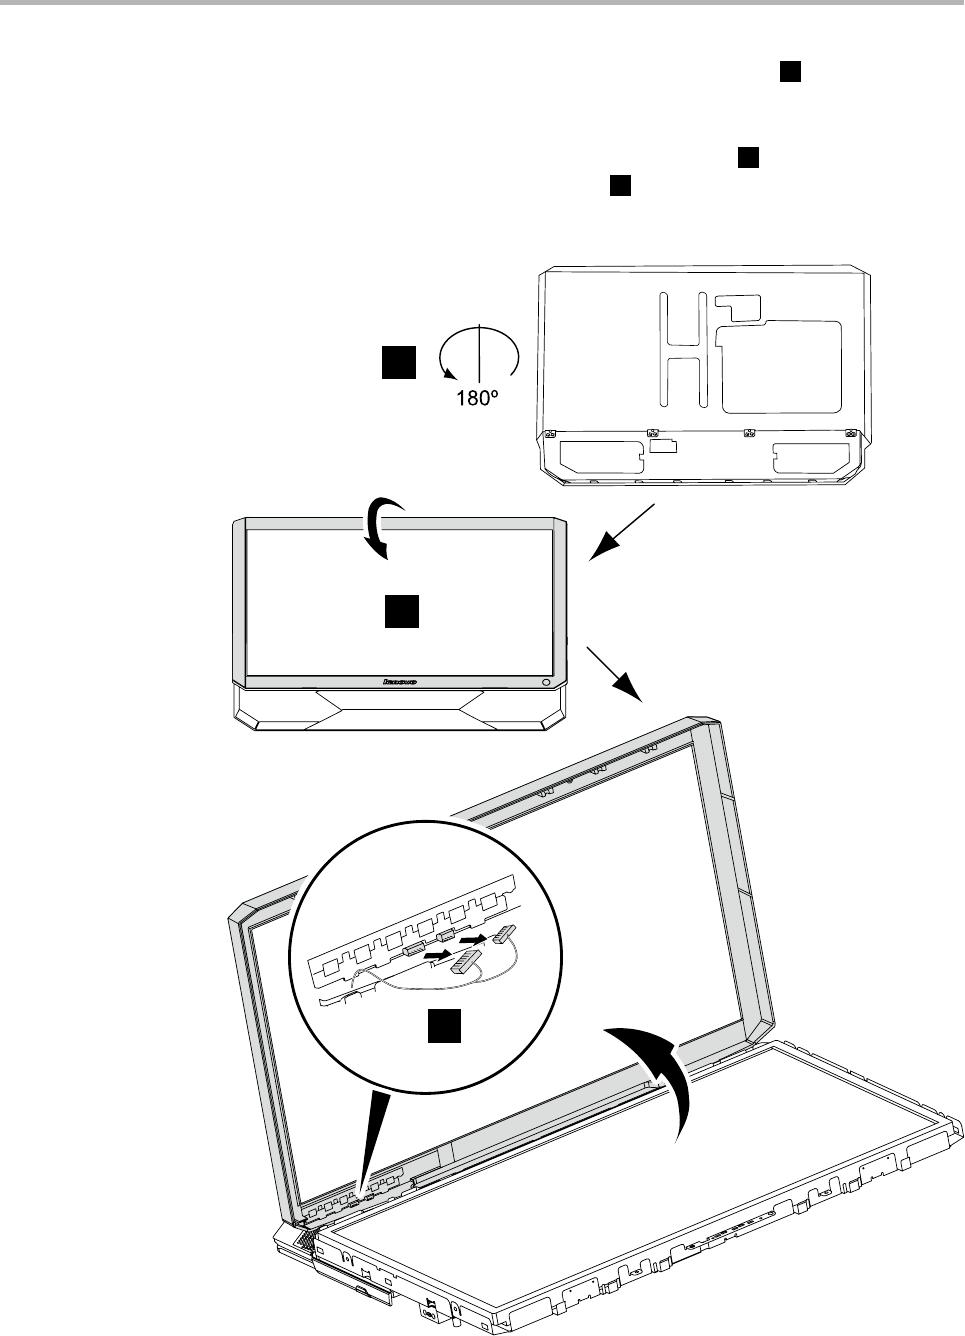 Lenovo Ideacentre B500 Hardware Maintenance Manual User